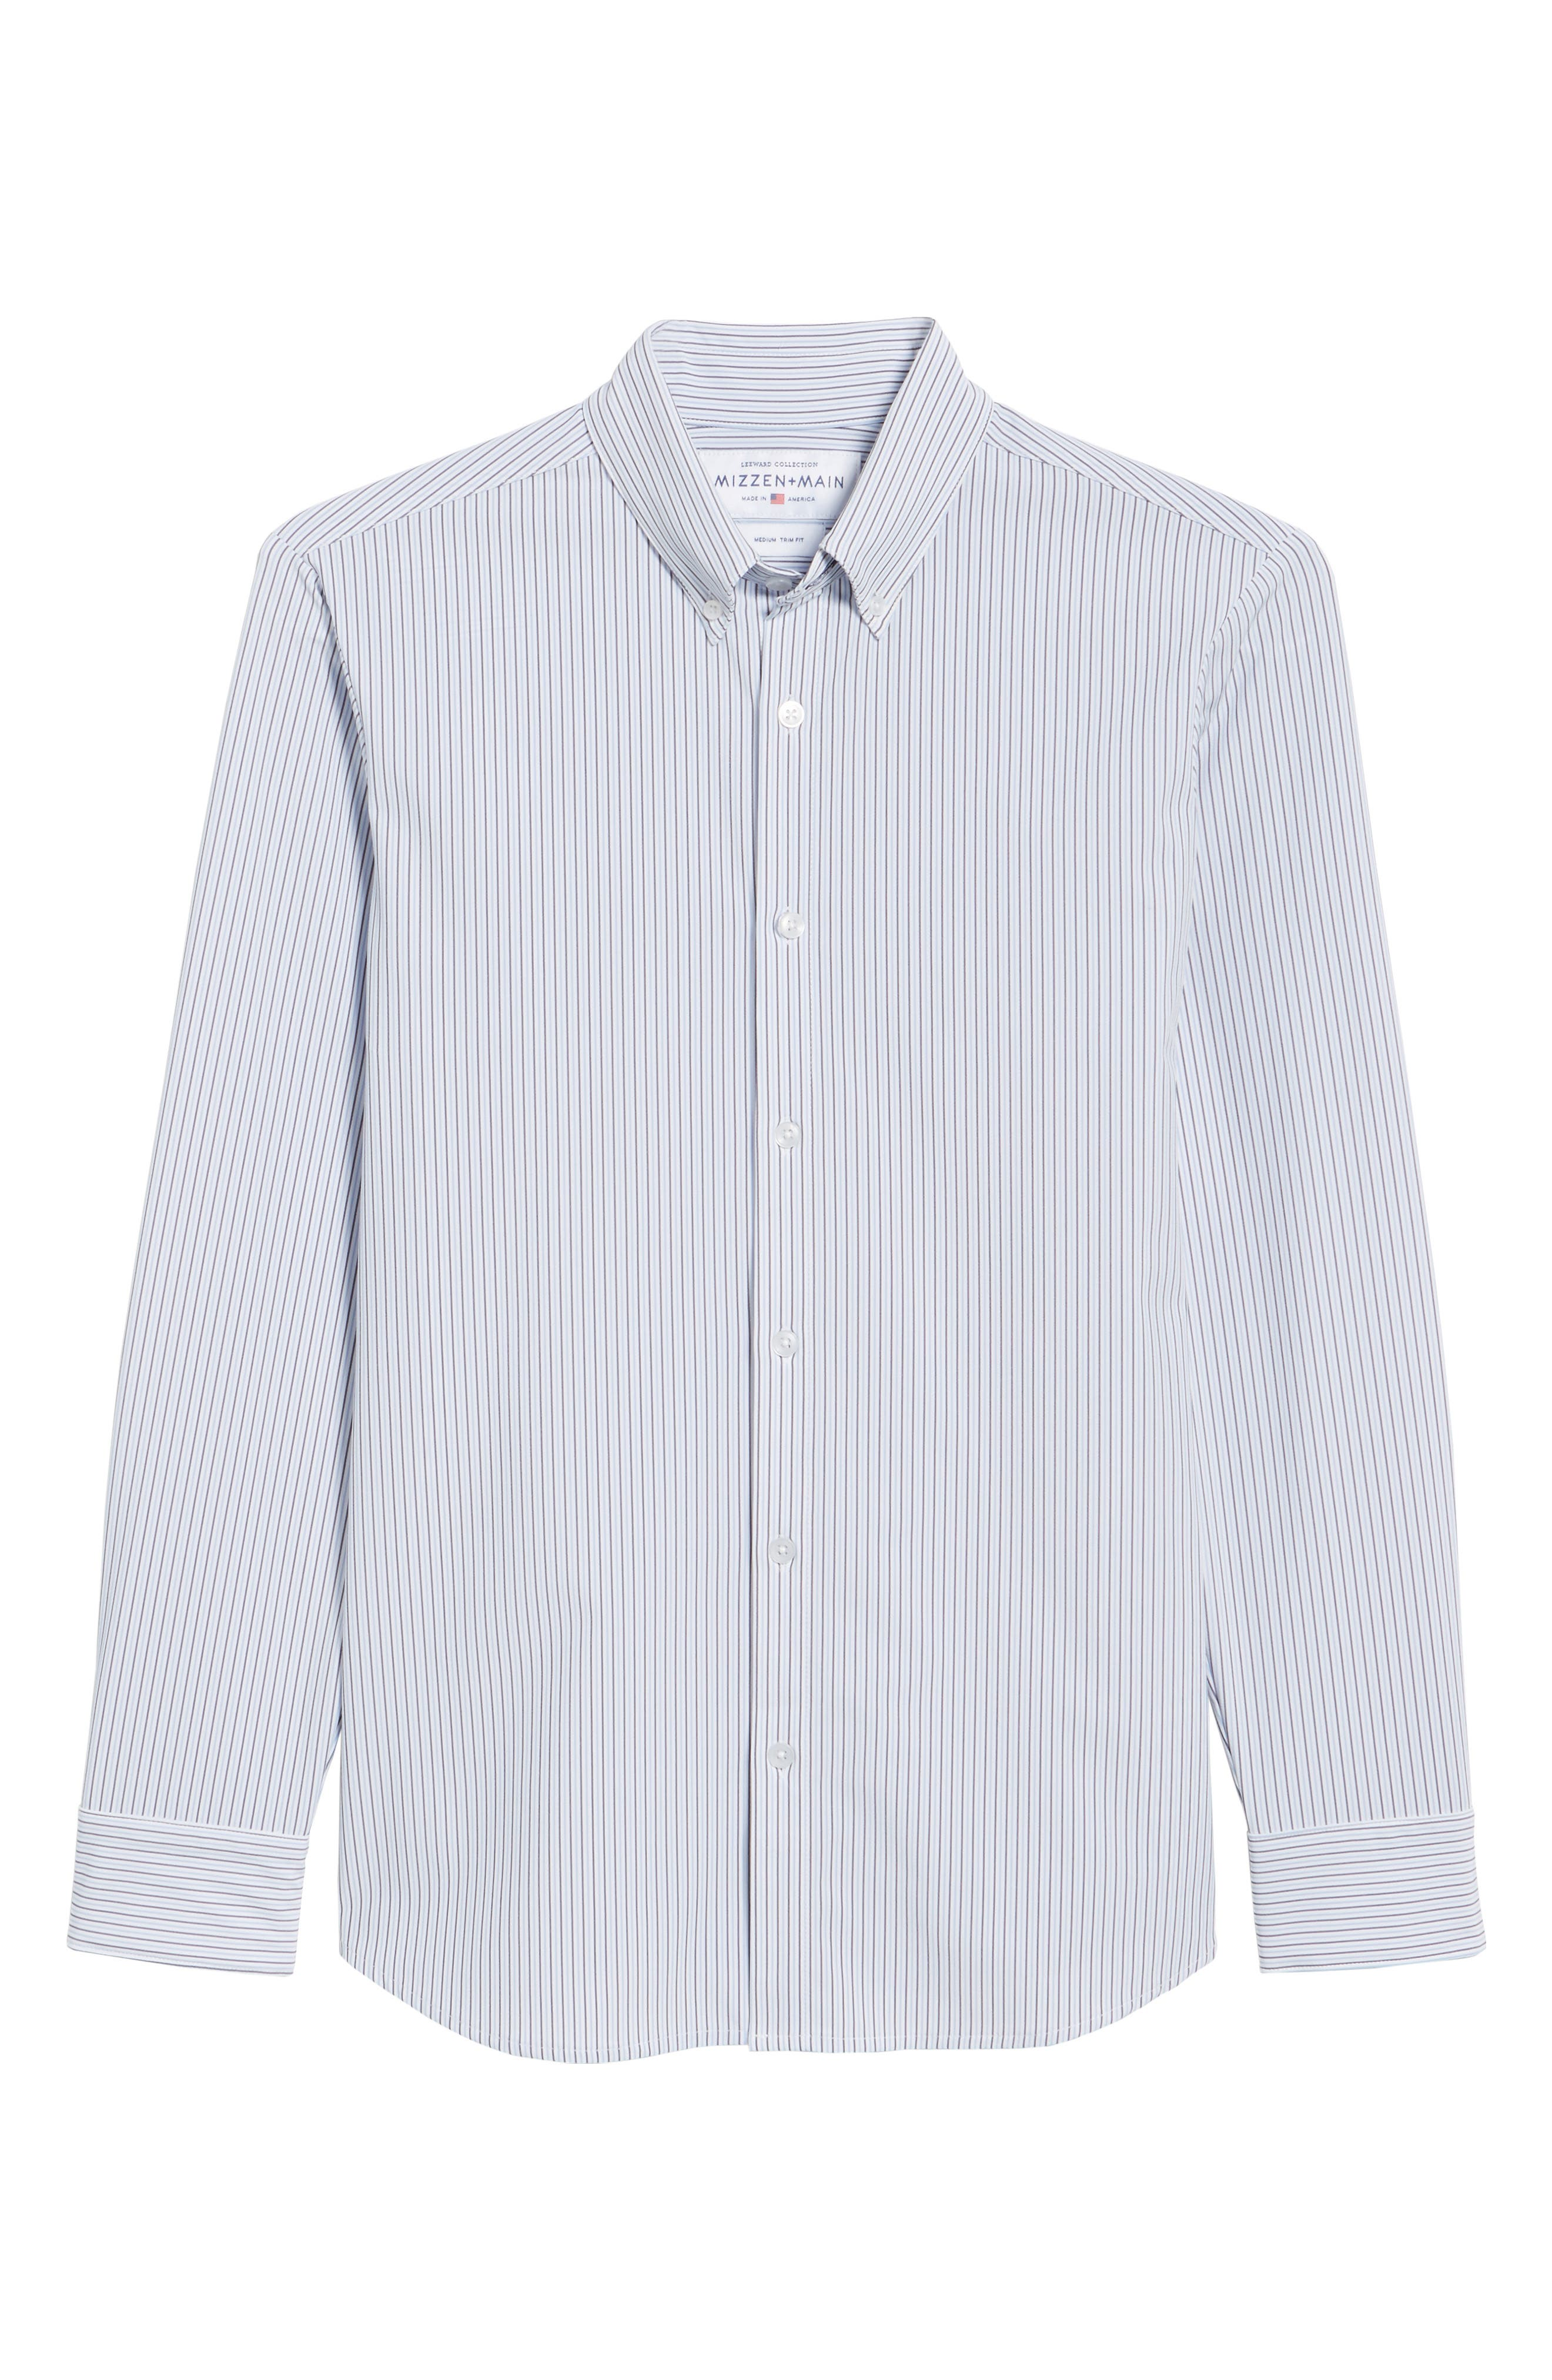 Callahan Stripe Sport Shirt,                             Alternate thumbnail 6, color,                             477